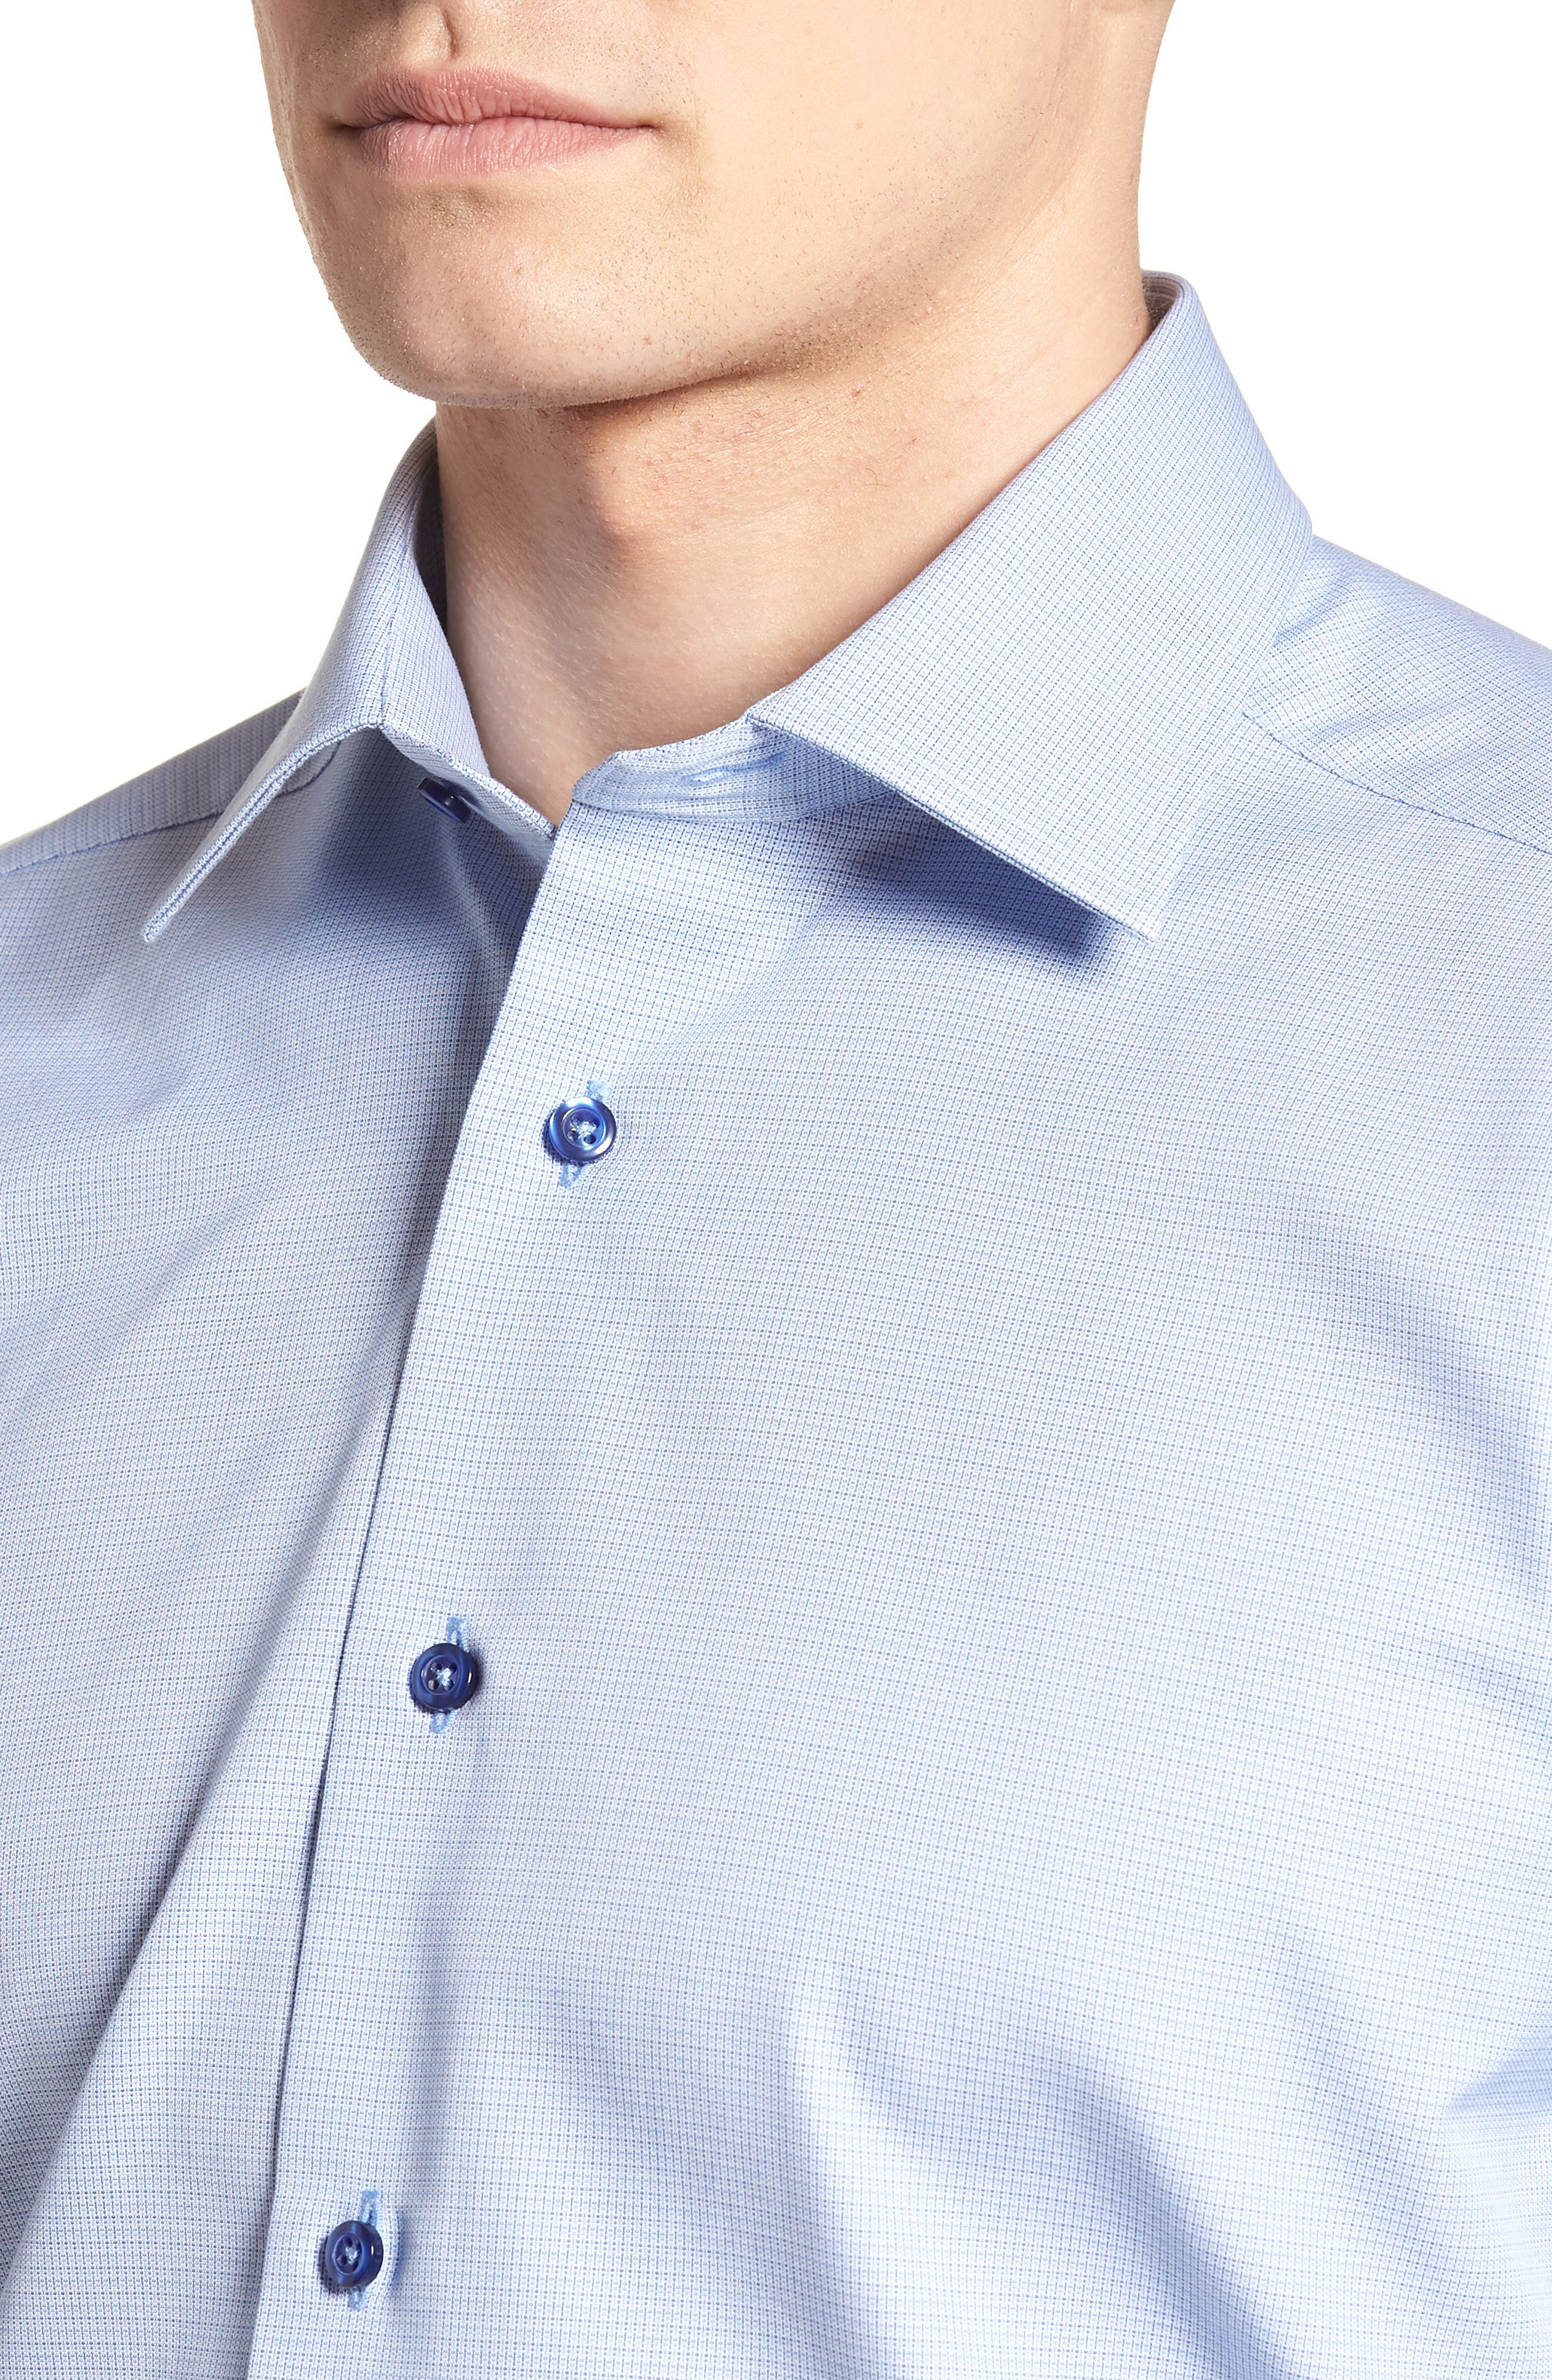 Regular Fit Solid Dress Shirt,                             Alternate thumbnail 2, color,                             423